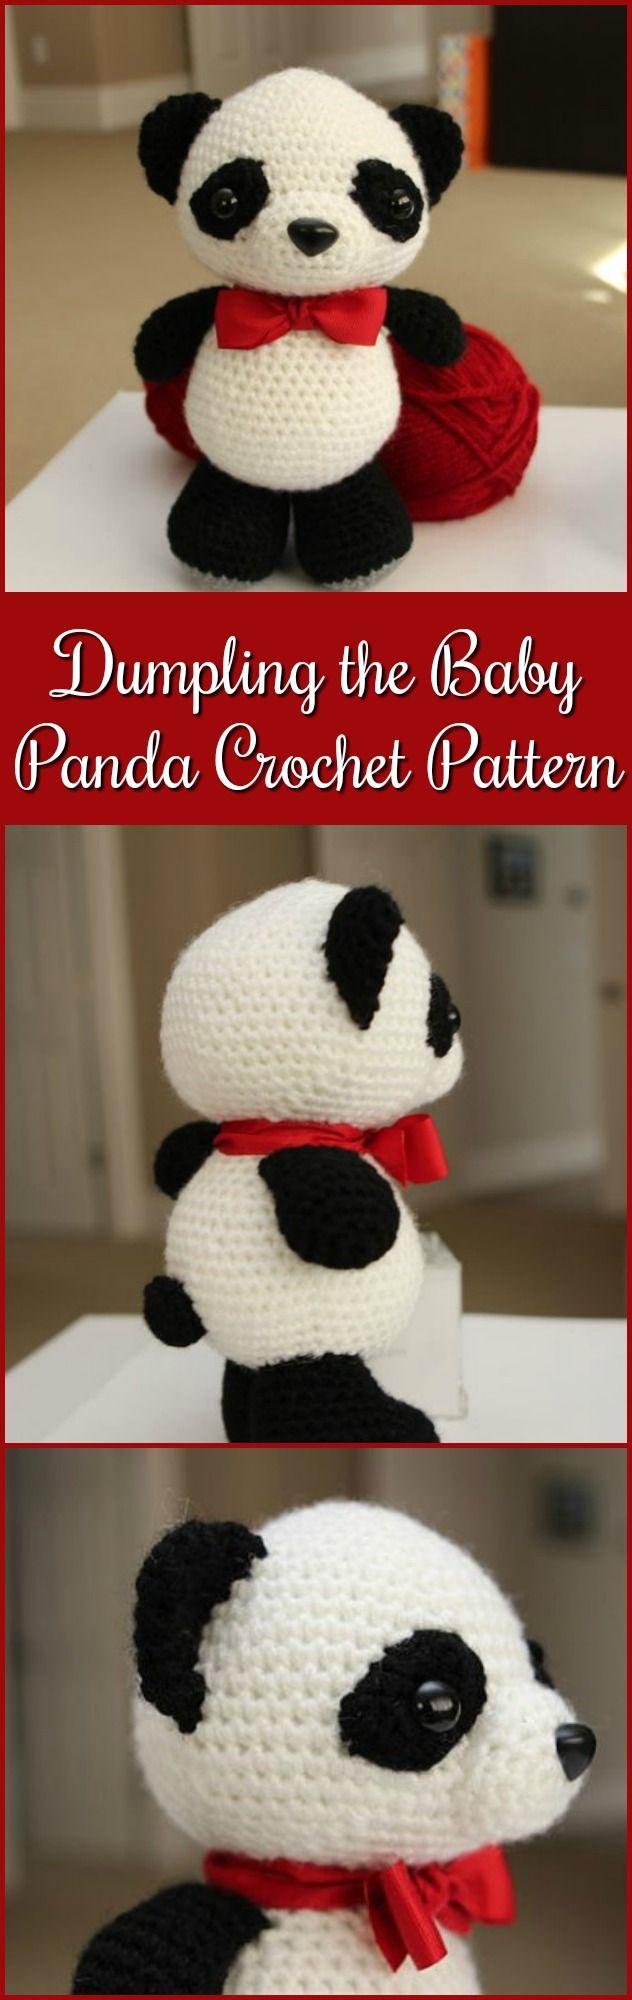 Dumpling The Baby Panda Amigurumi Crochet Pattern Crochet Ad